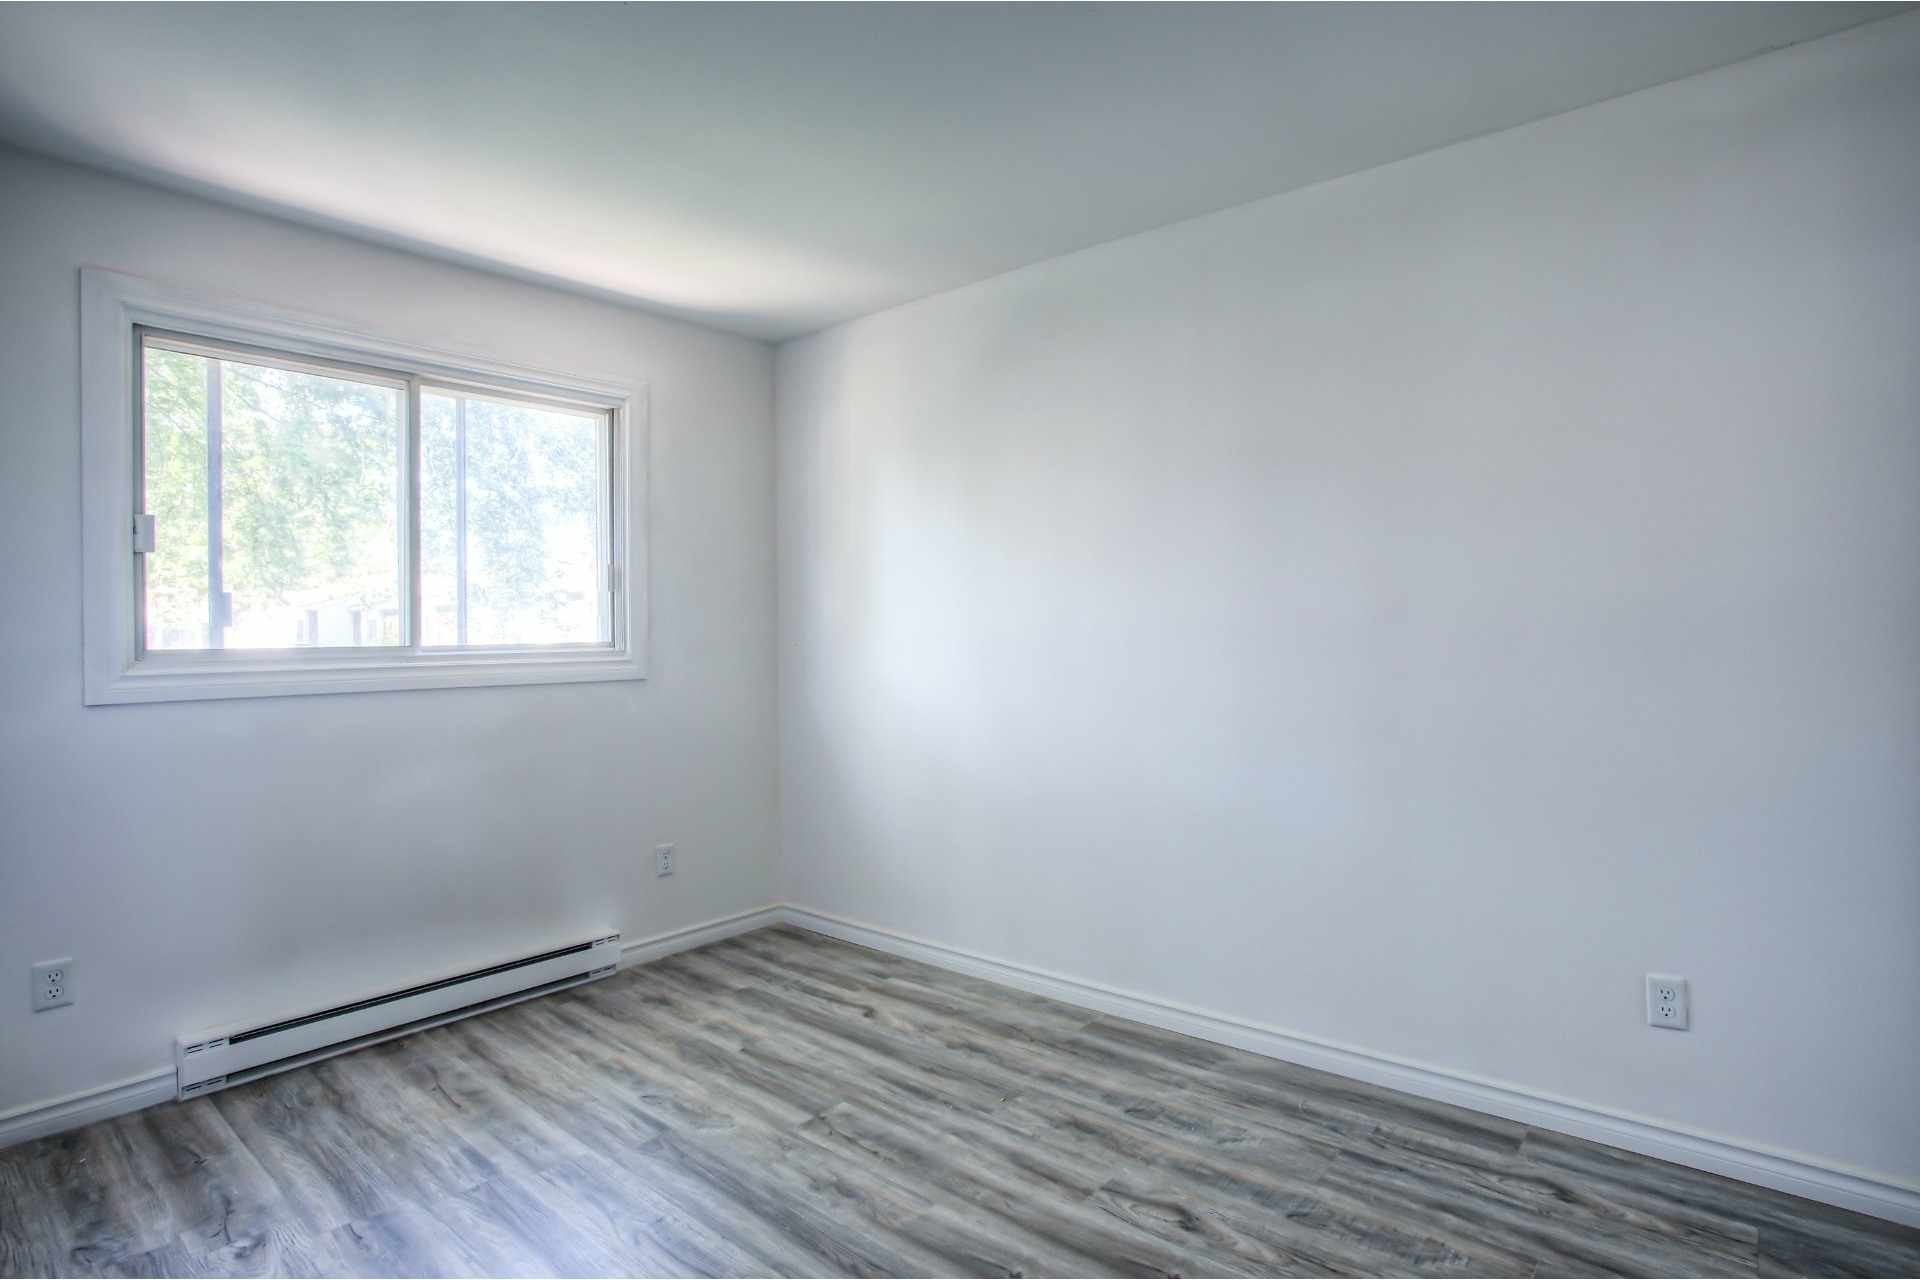 image 15 - MX - Casa sola - MX En venta Dollard-Des Ormeaux - 7 habitaciones